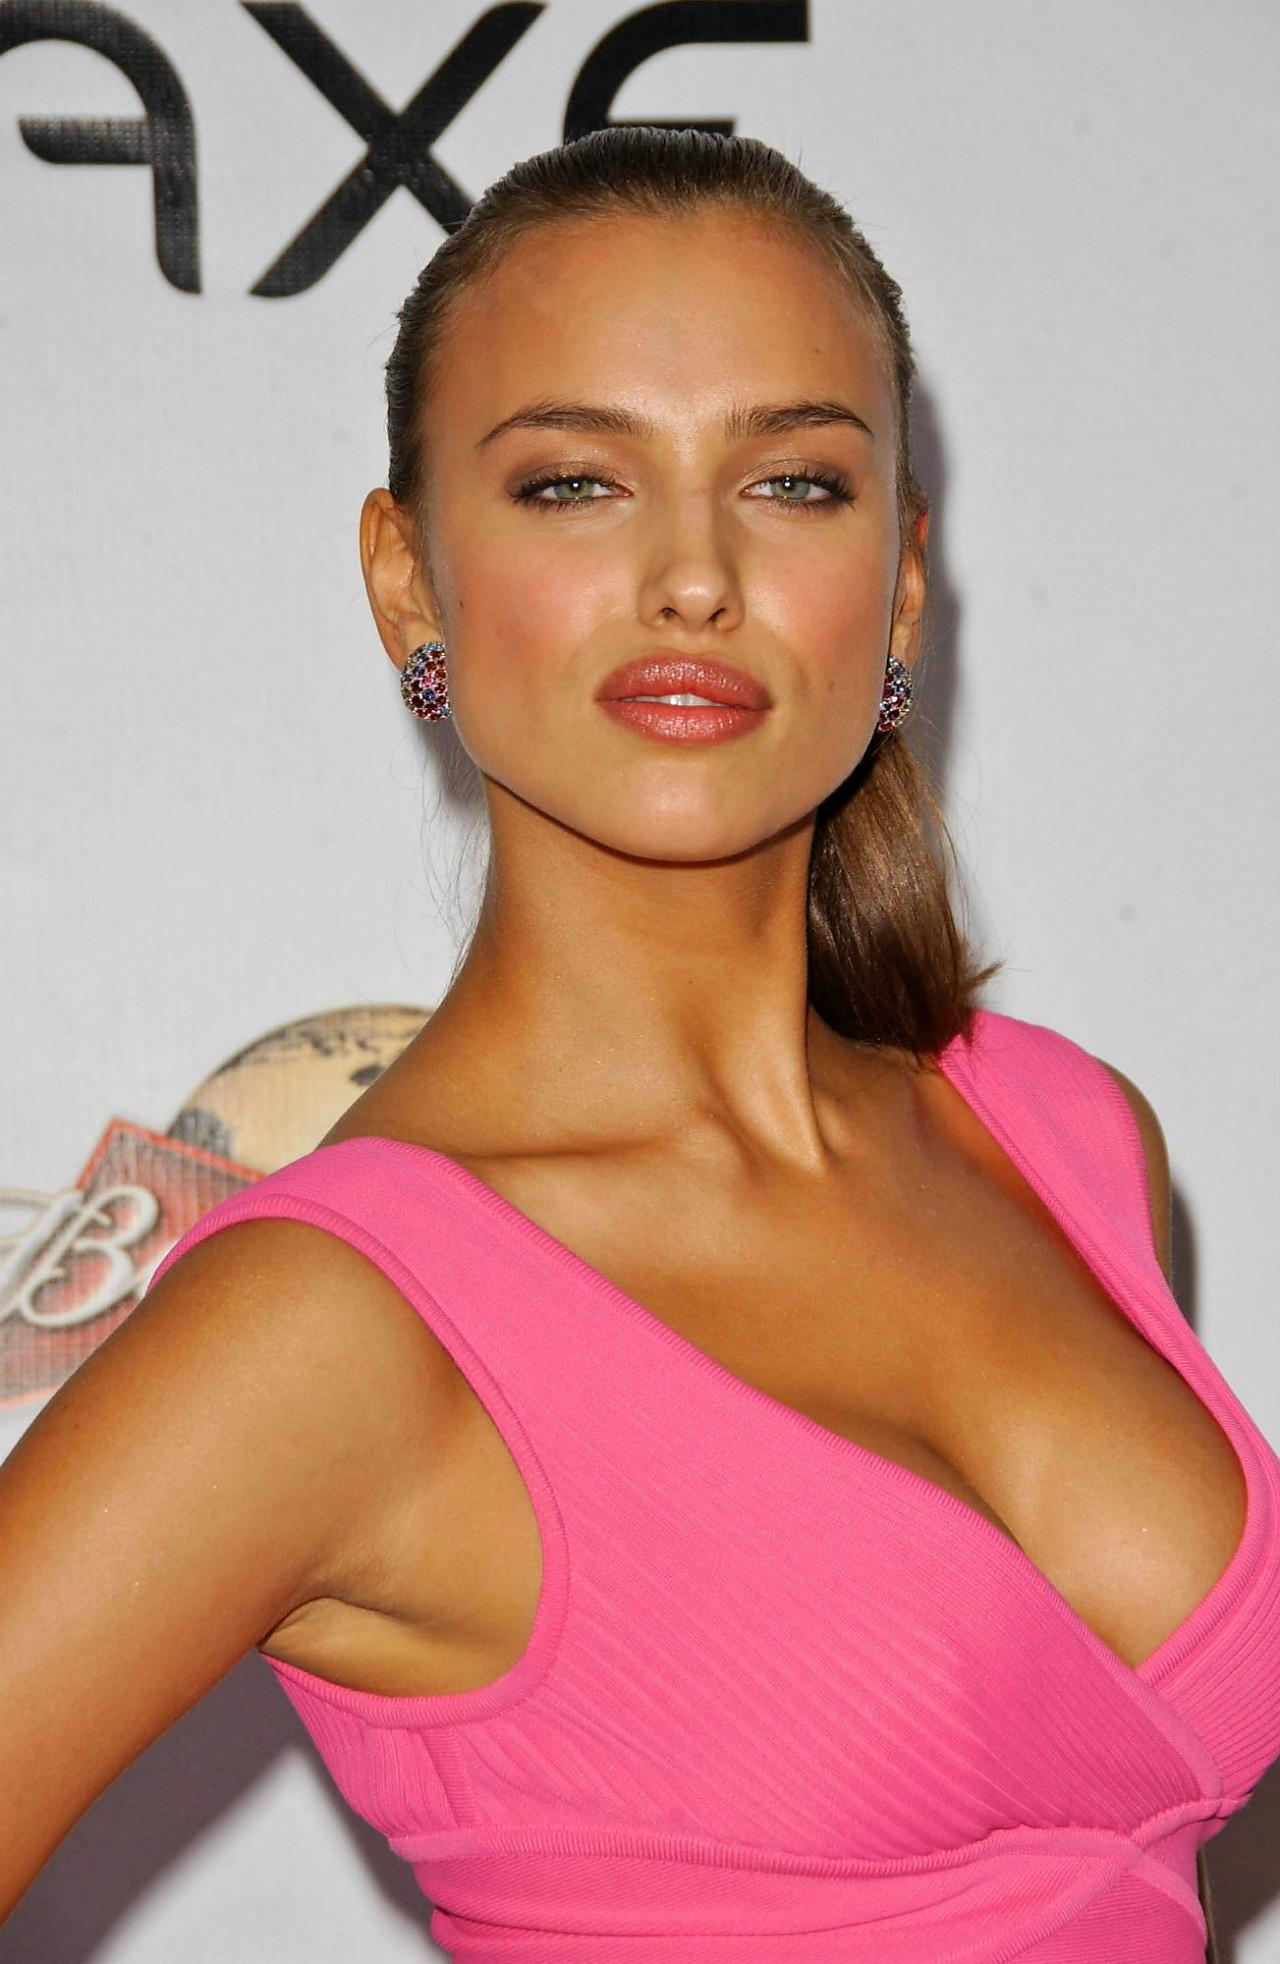 Bikini chaud beautés russes